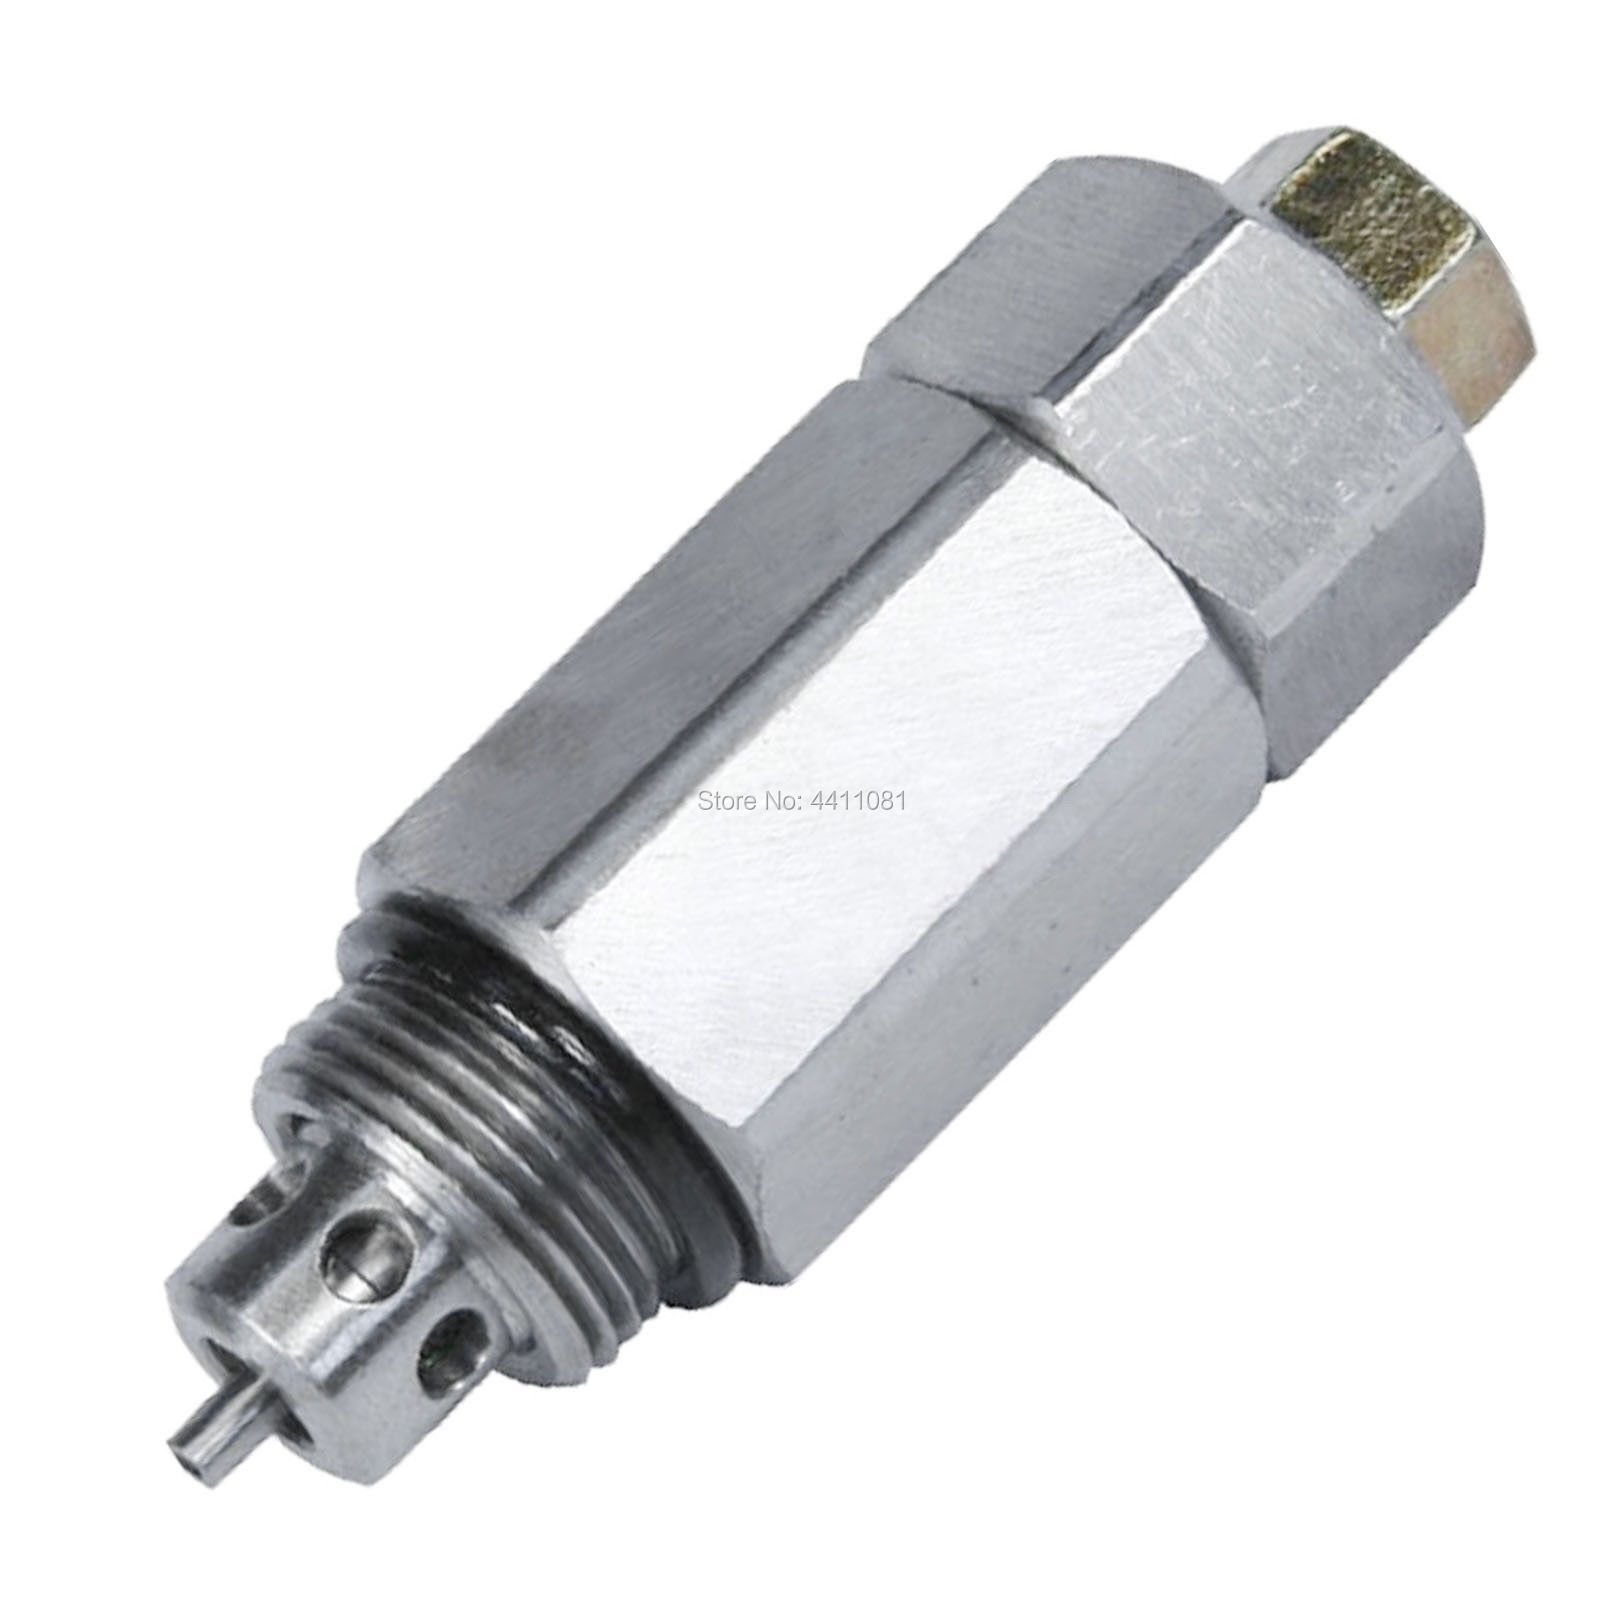 EX200-3 EX200-5 Main Control Valve Assy 4372039 for Hitachi Excavator, 3 month warranty pc400 5 pc400lc 5 pc300lc 5 pc300 5 excavator hydraulic pump solenoid valve 708 23 18272 for komatsu